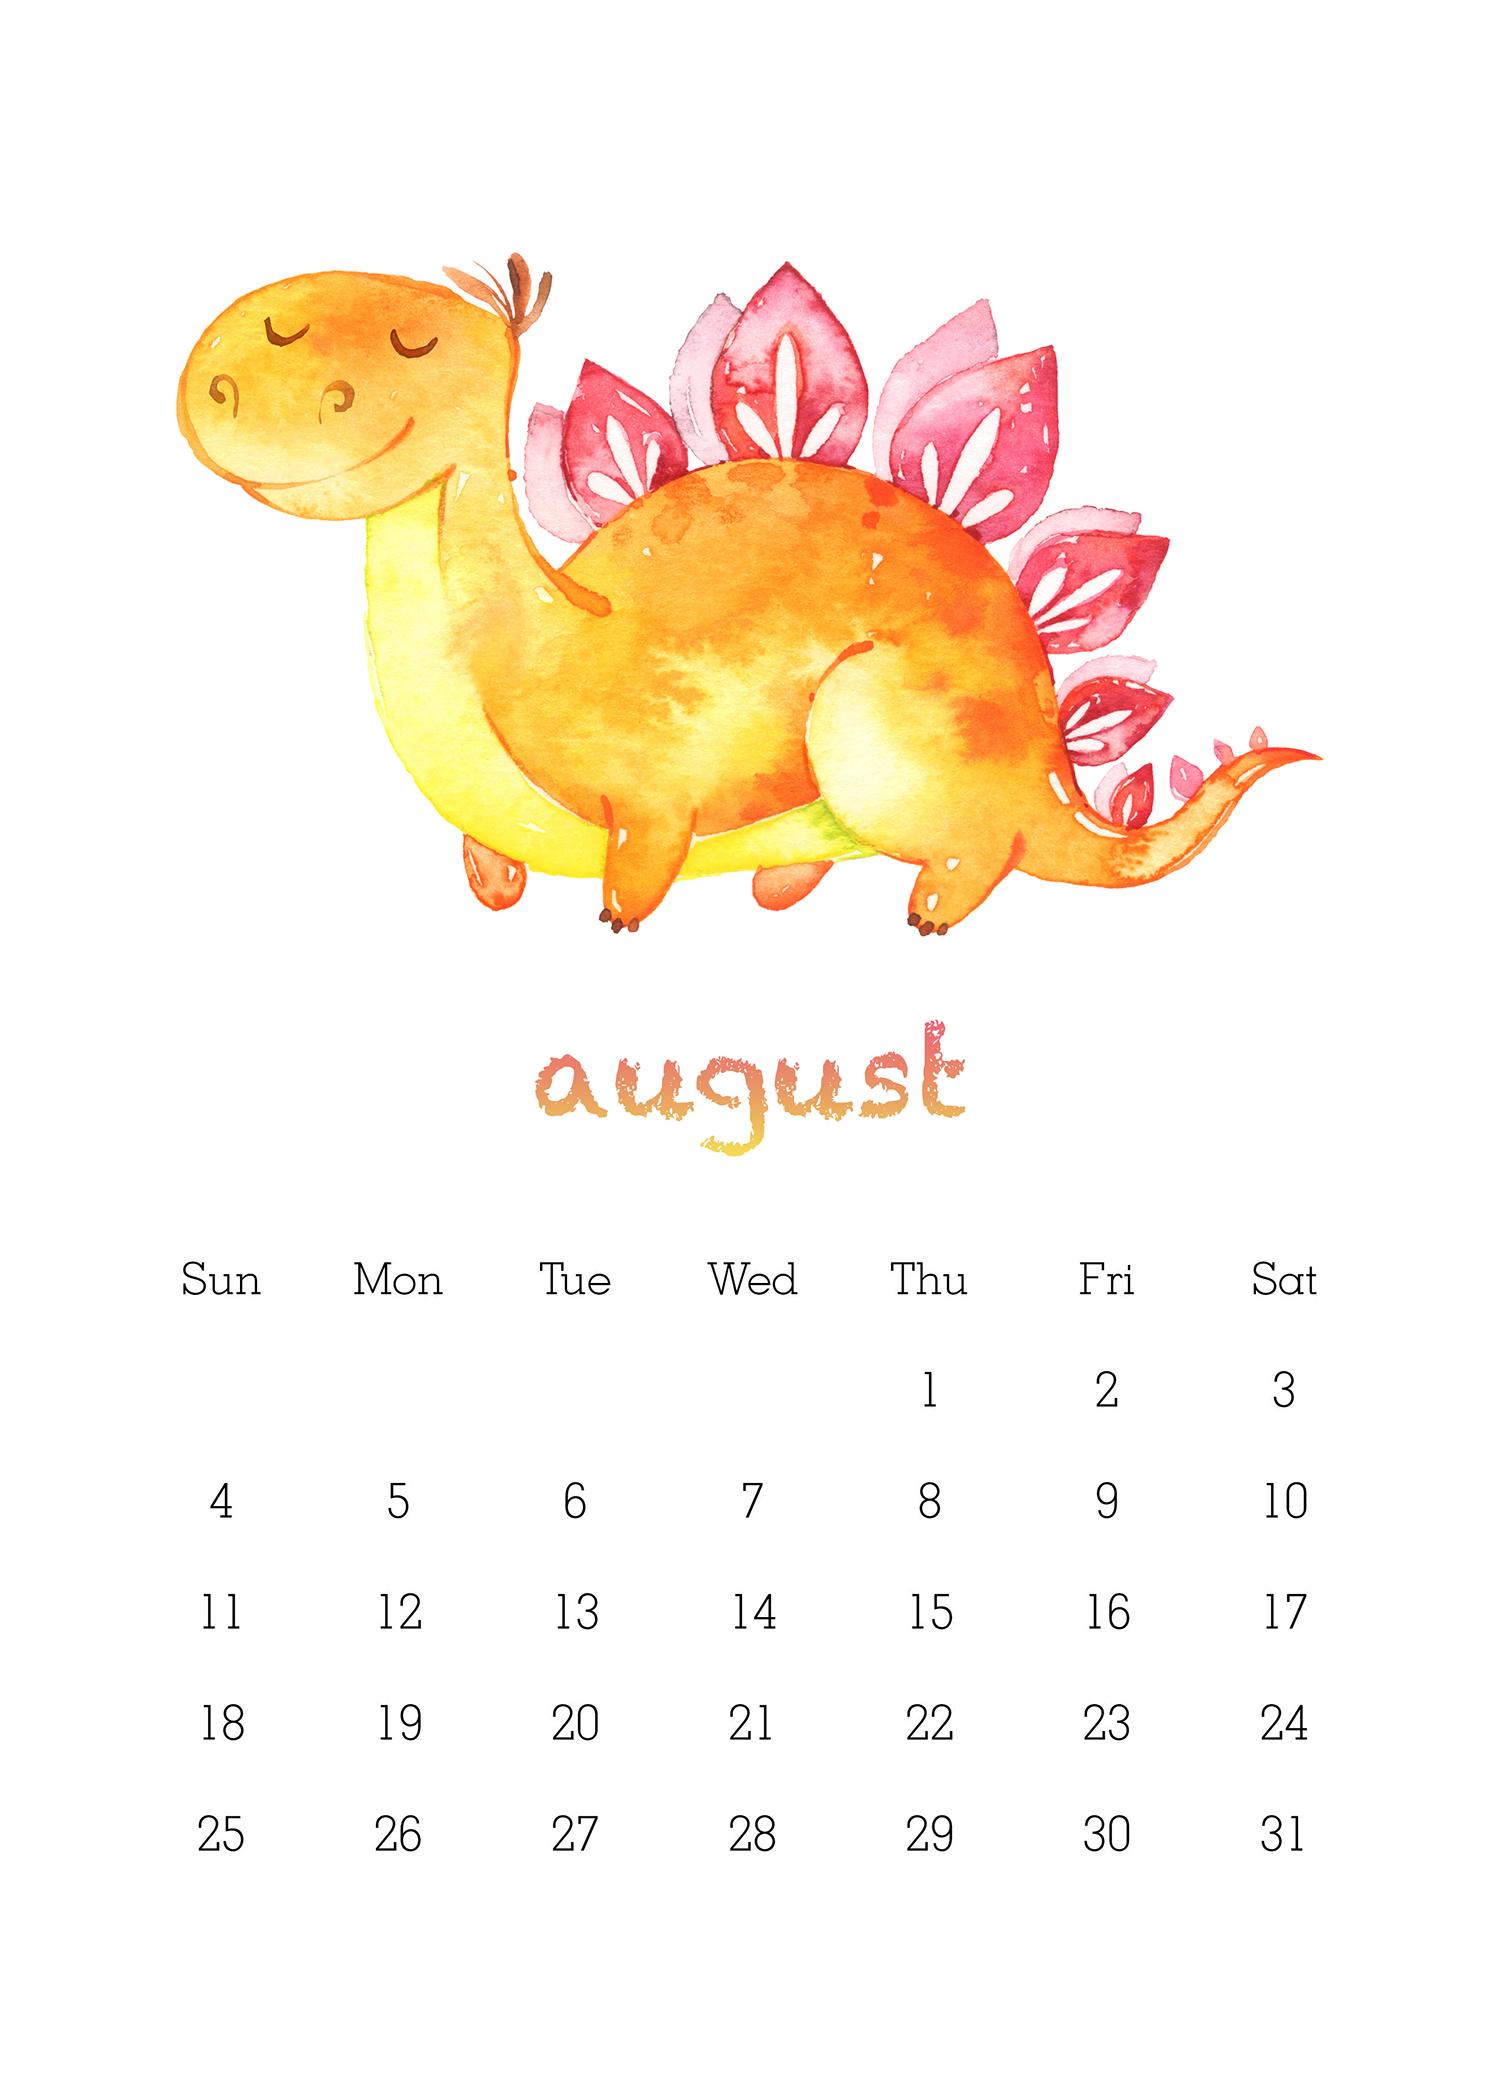 Free Printable 2019 Watercolor Dinosaur Calendar - The ...